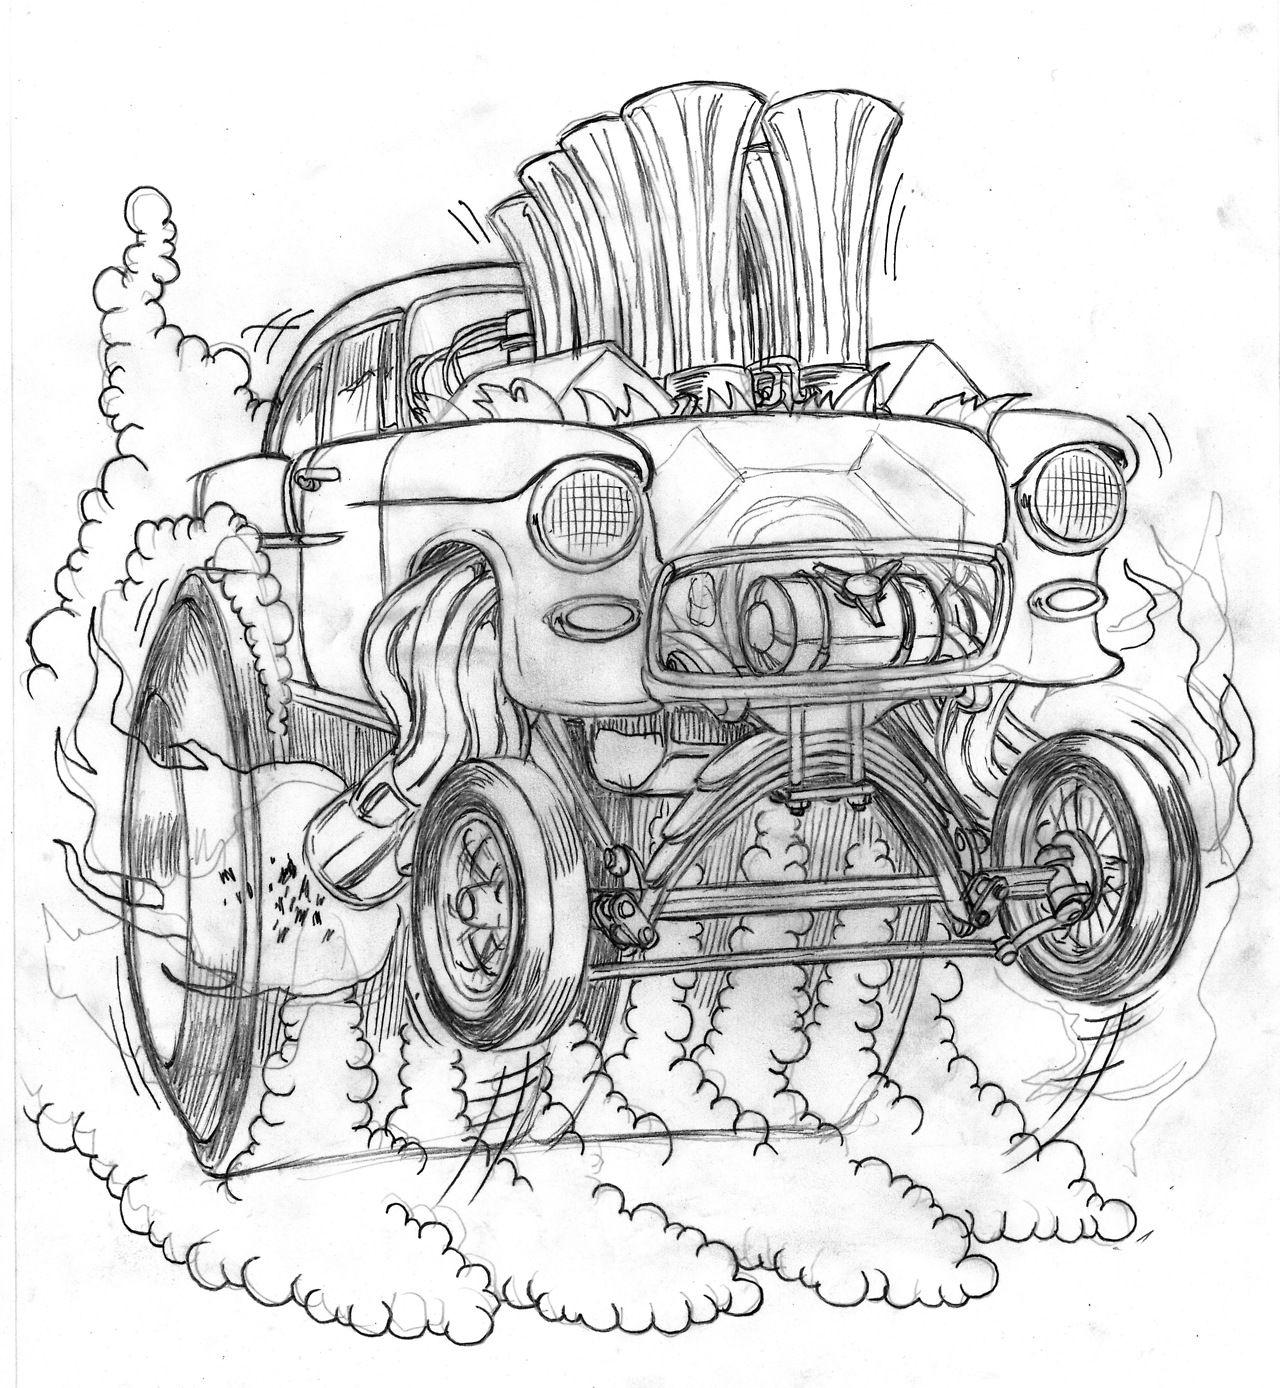 sketch 55 chevy gasser by coop illustration design pinterest Big Rig Rat Rod Trucks sketch 55 chevy gasser by coop